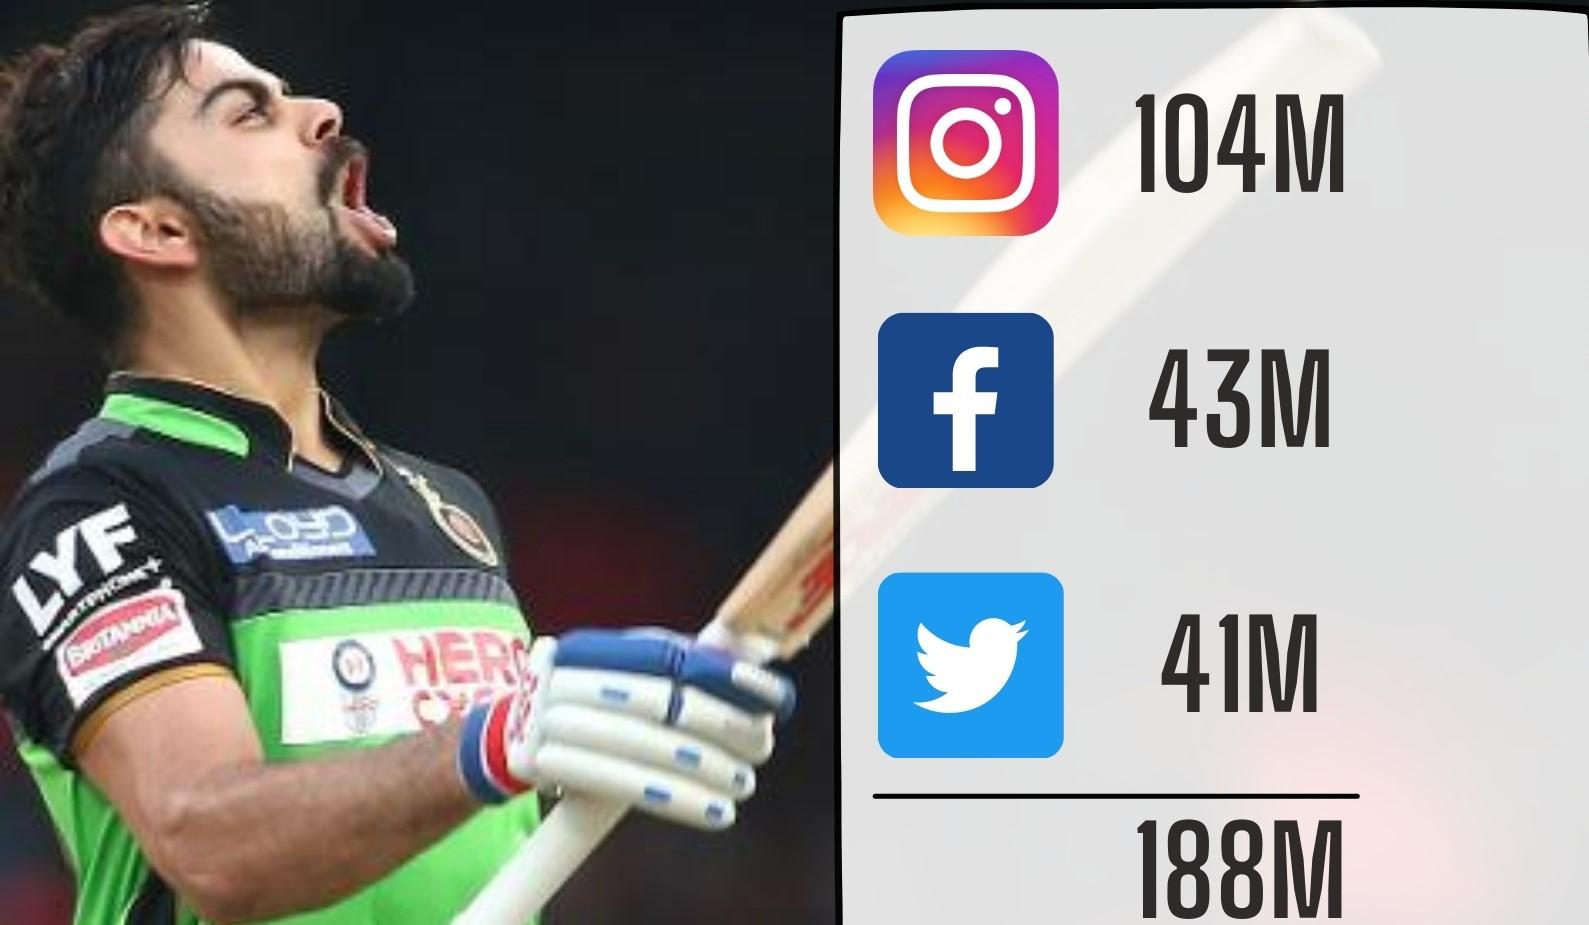 Virat Kohli's 18.8 million followers